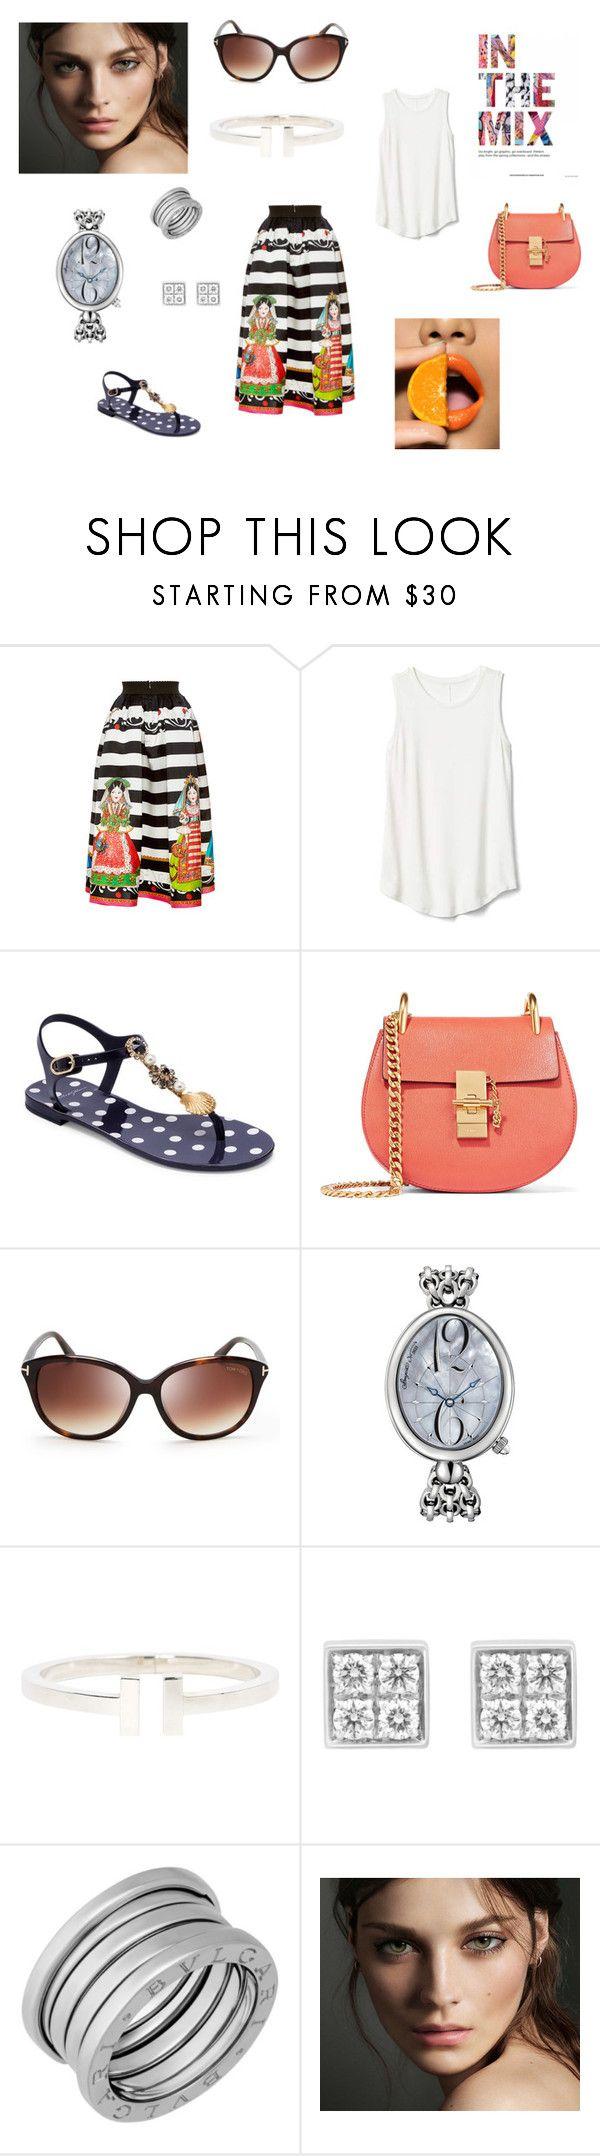 Летнее настроениме by alisa-onma on Polyvore featuring мода, Gap, Dolce&Gabbana, Chloé, Tiffany & Co., Breguet, Bulgari, Tom Ford and Burberry